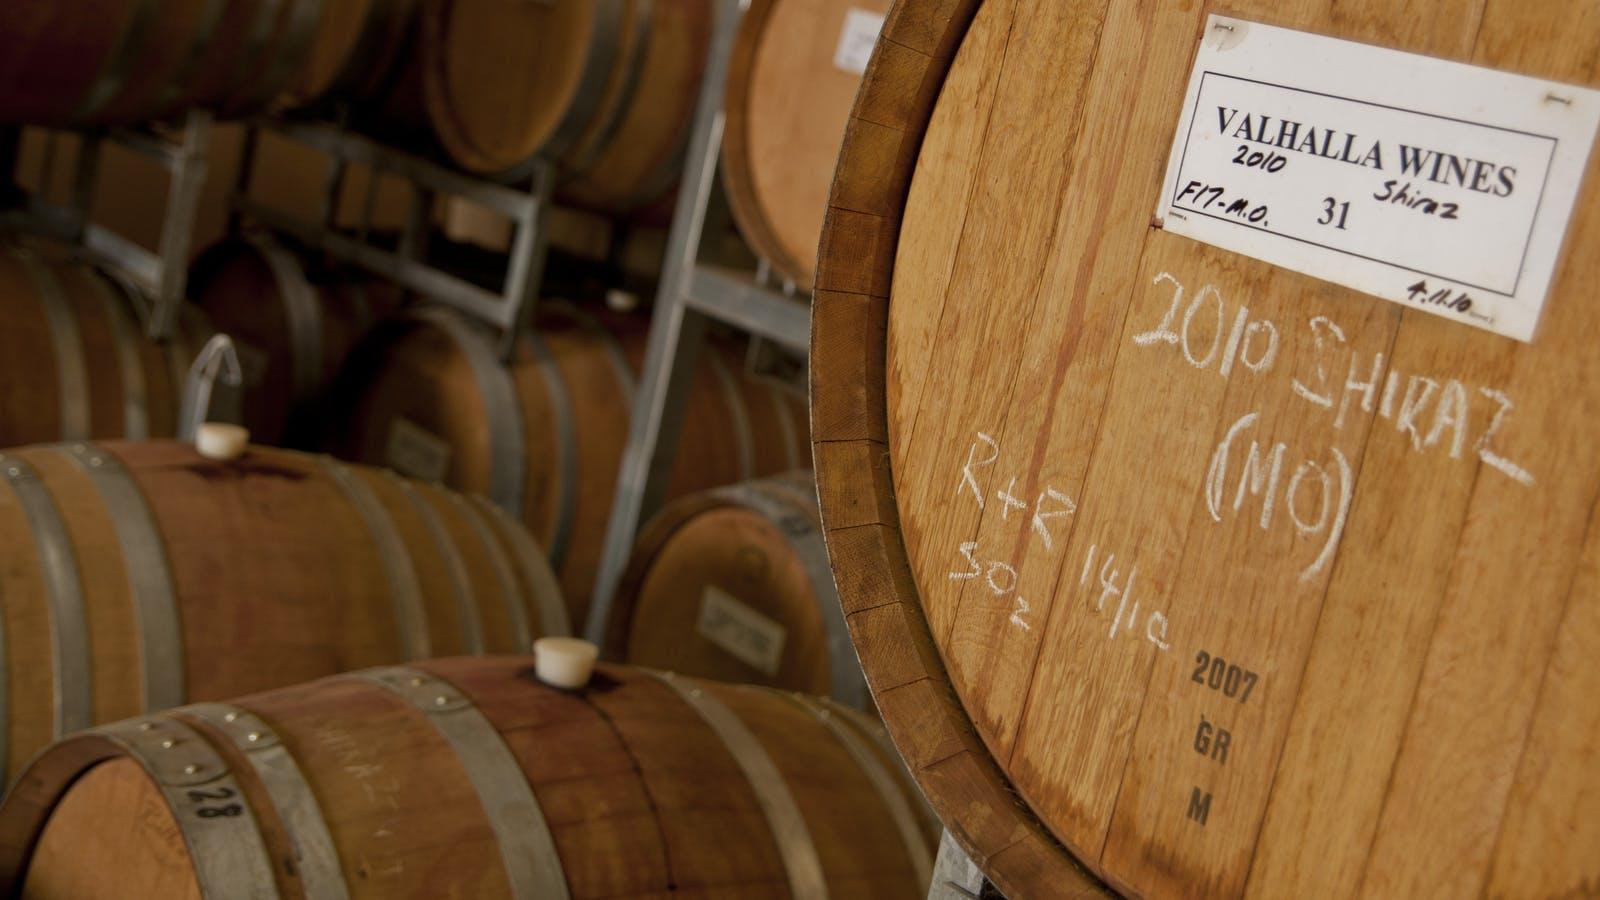 Barrels in the Cellar